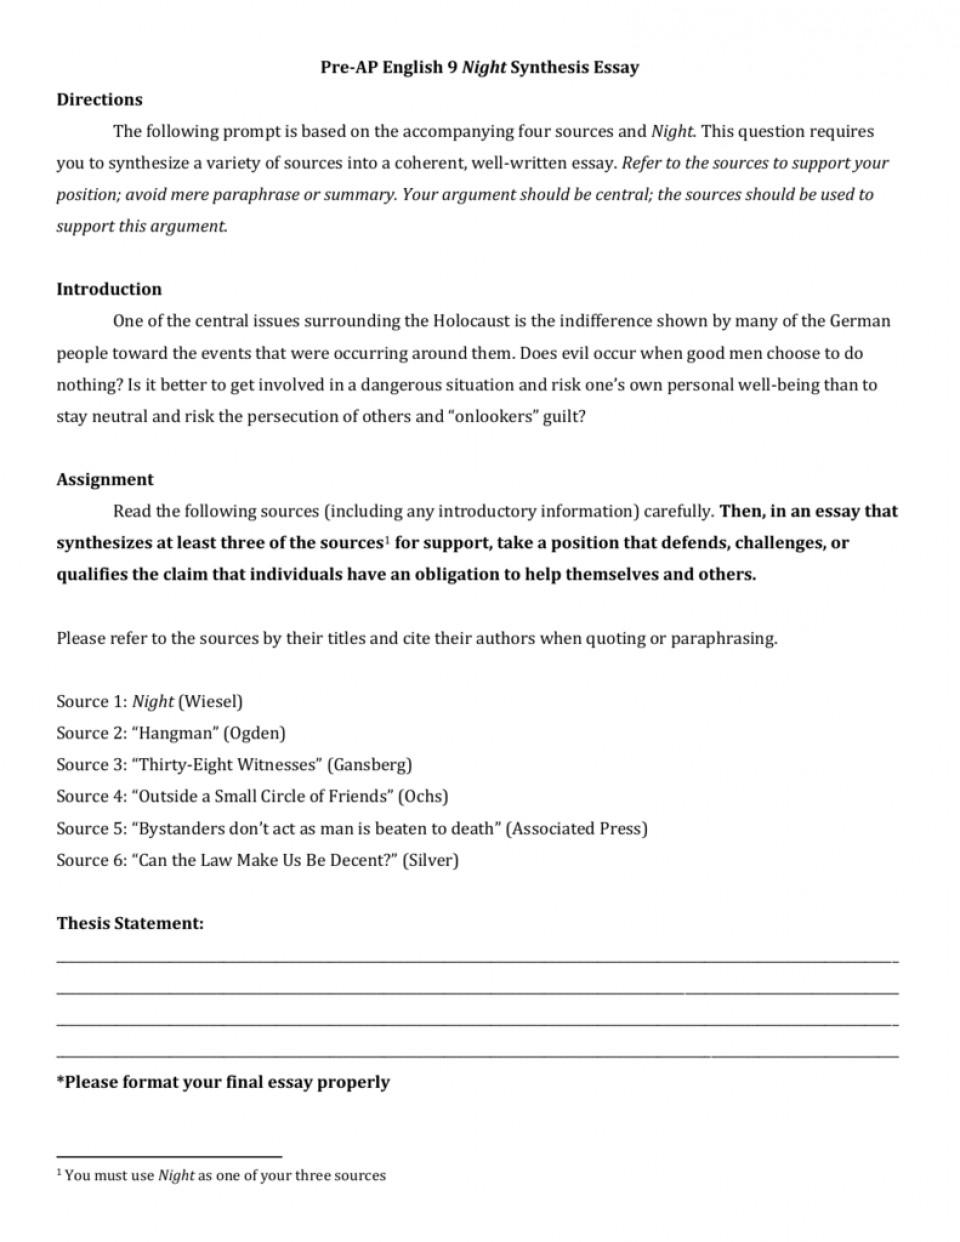 003 006963363 1 Synthesis Essay Sensational Prompt Outline Pdf 960